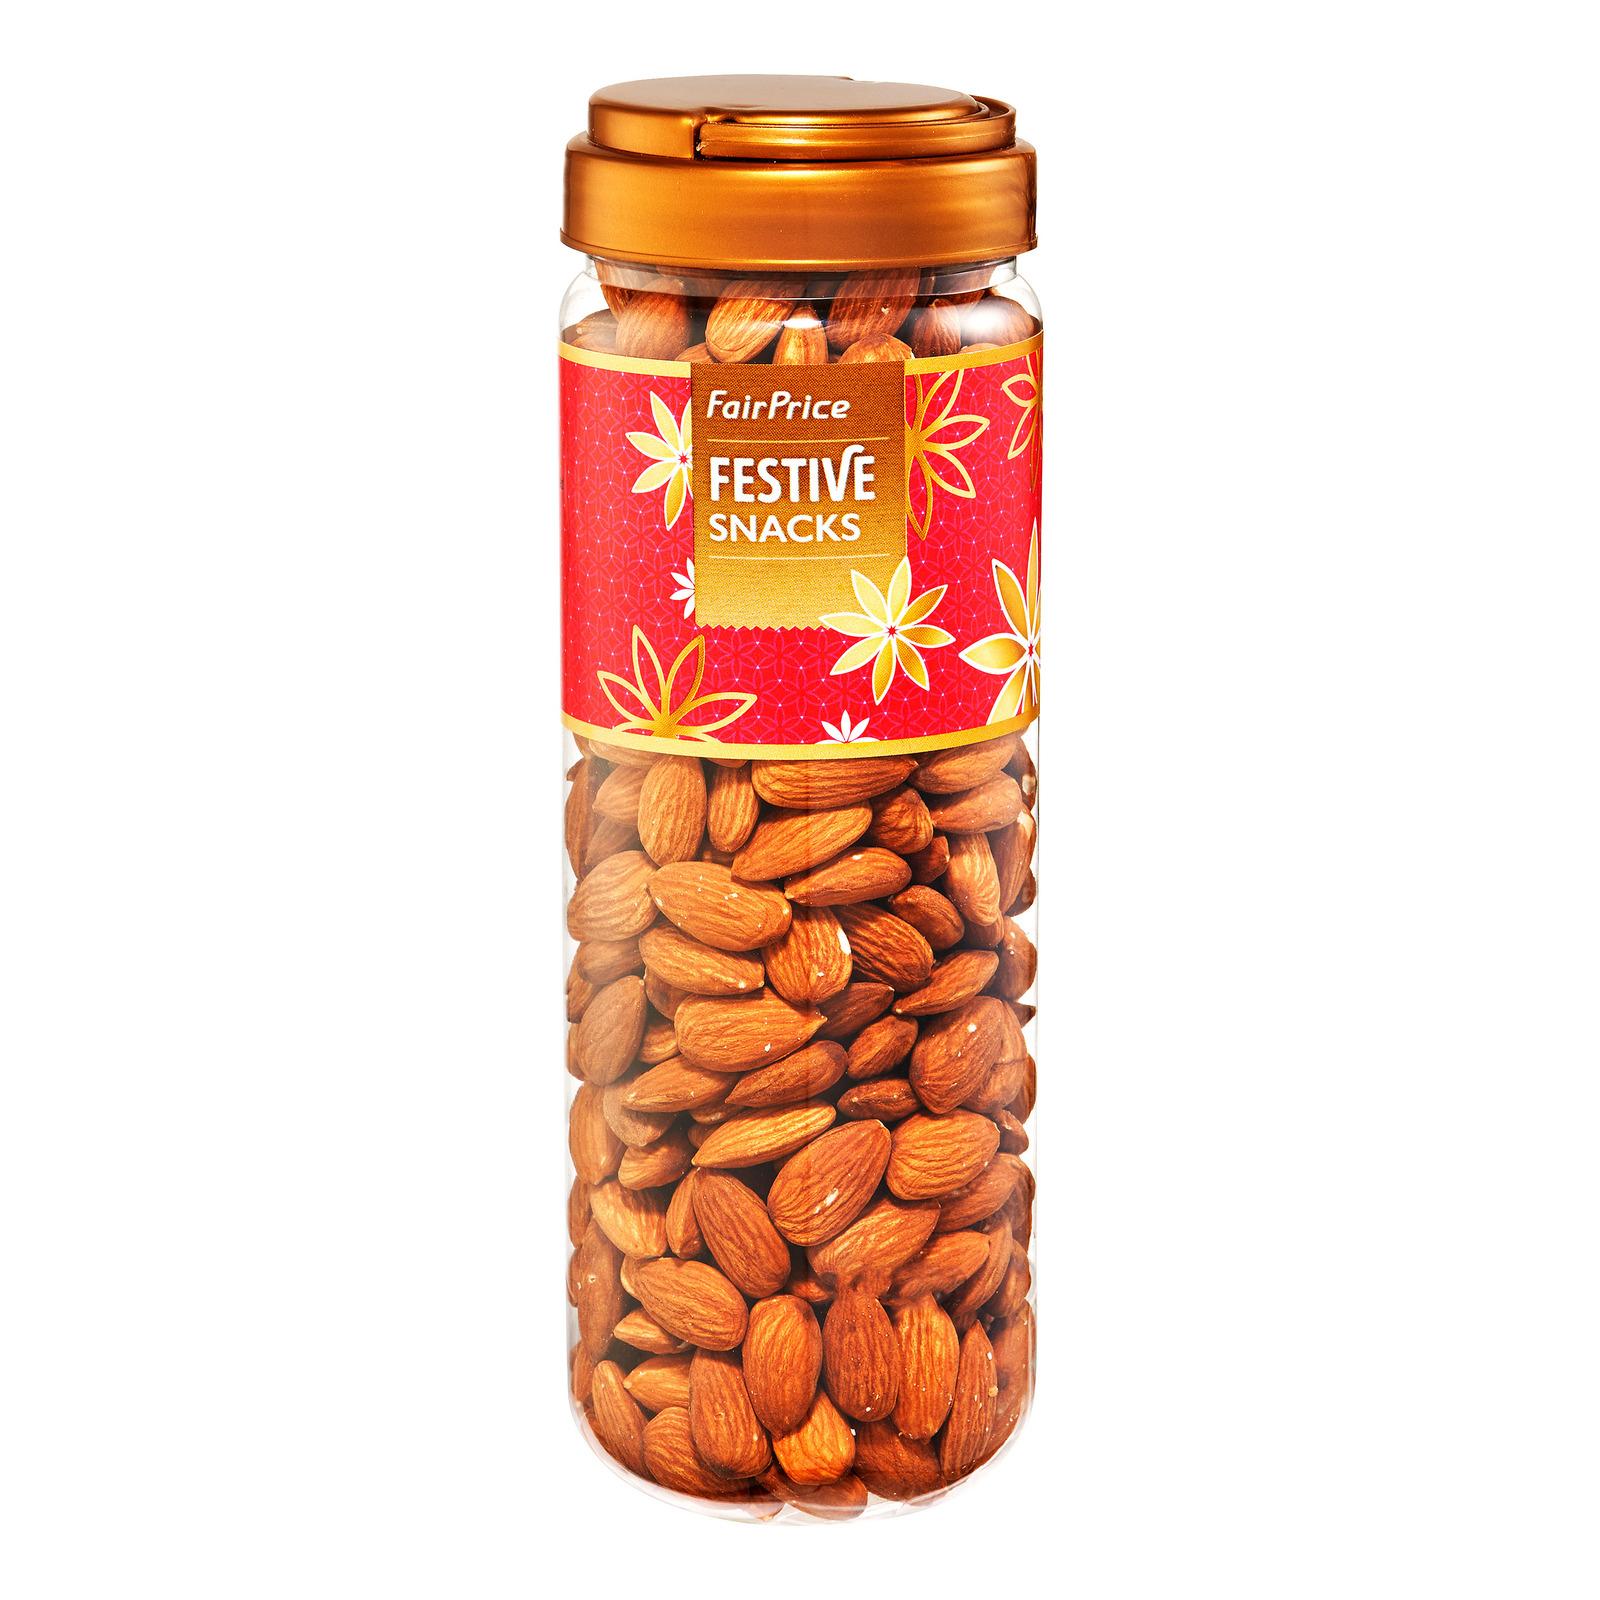 FairPrice Festive Snacks - Baked Almonds